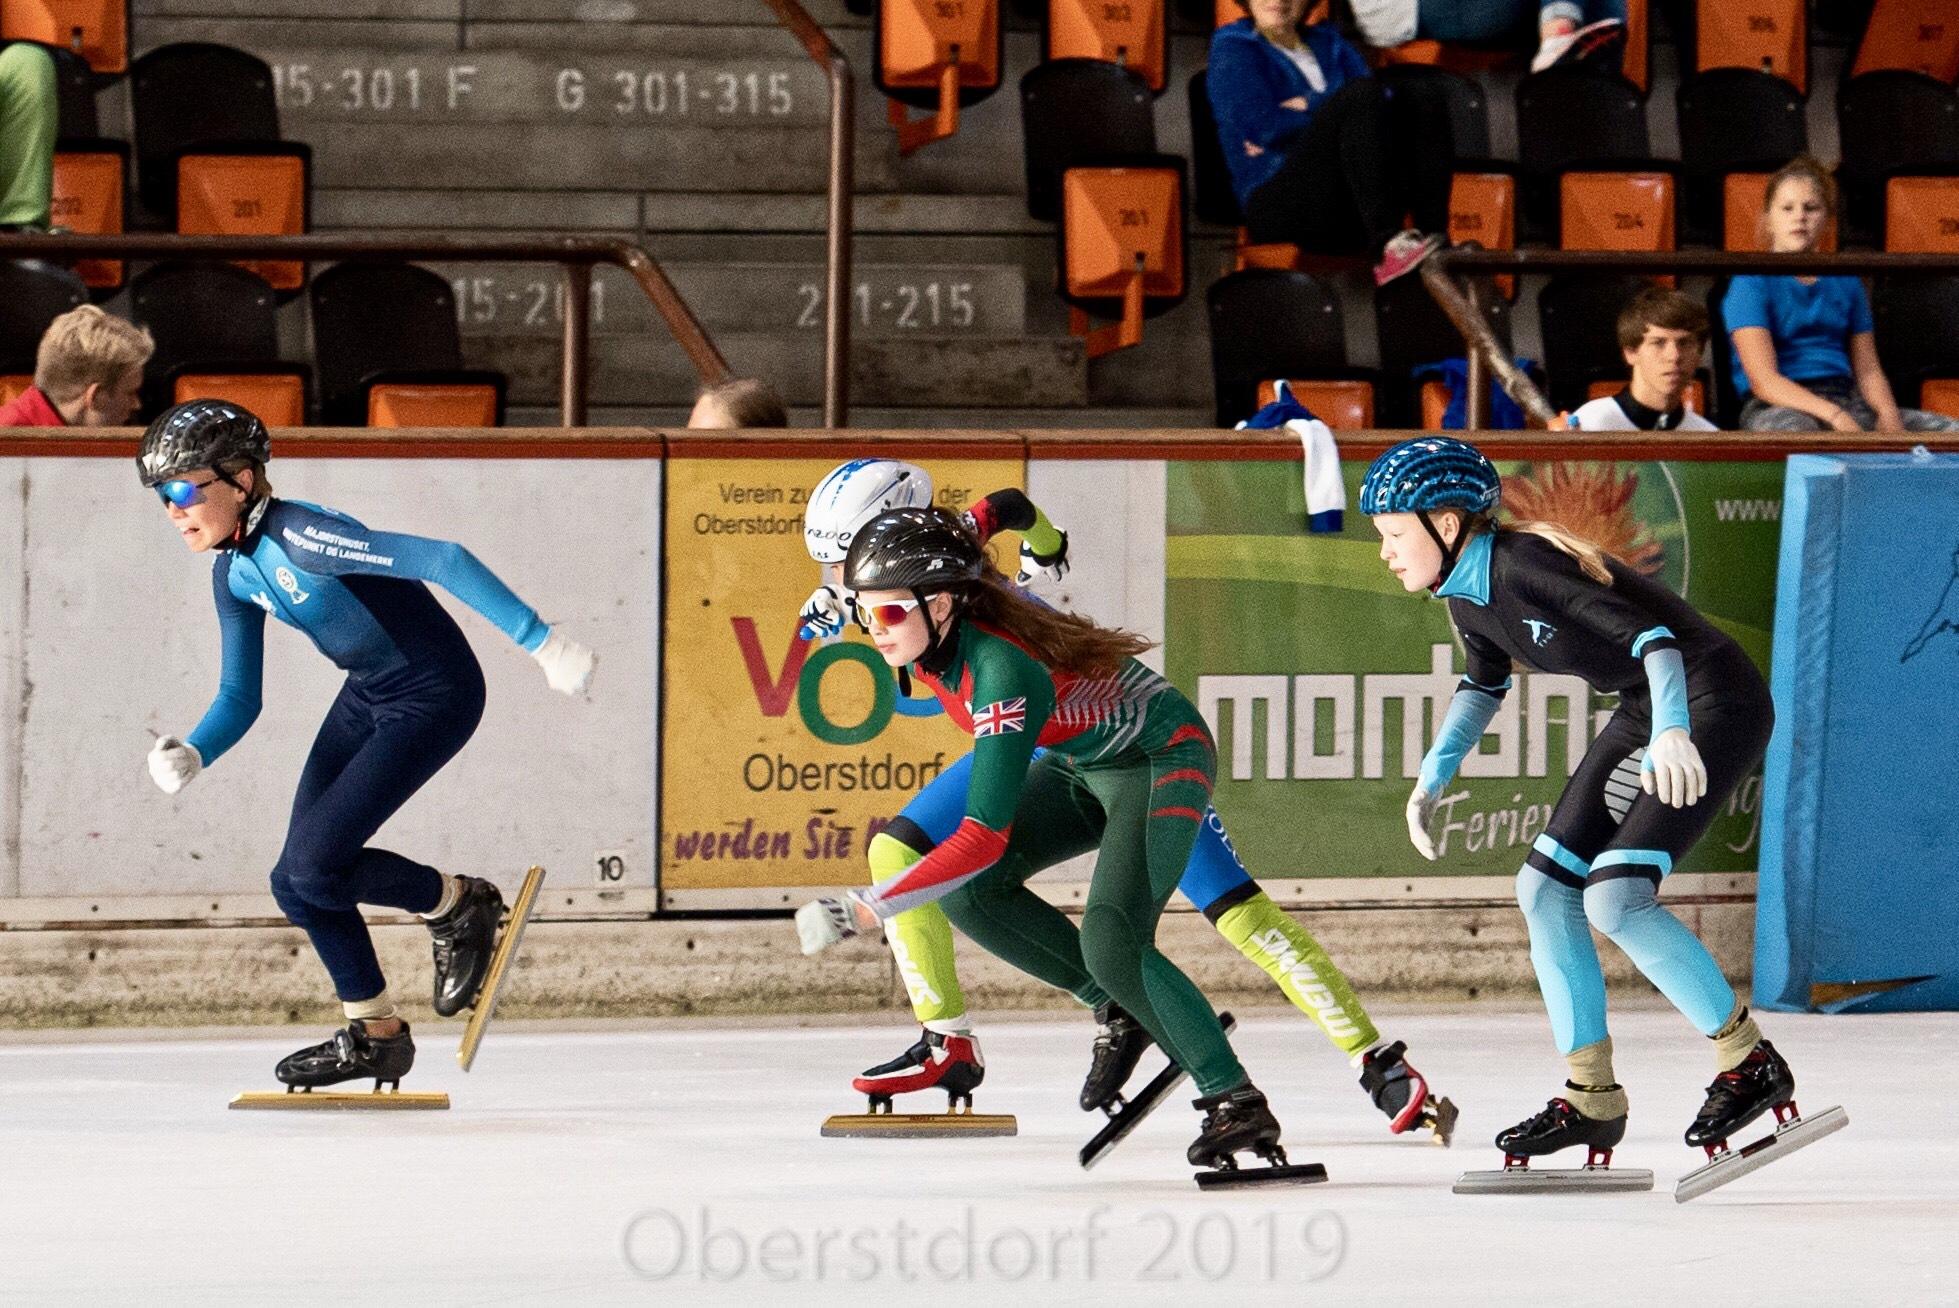 Trening gruppe 4 (Foto: Mark Damen)